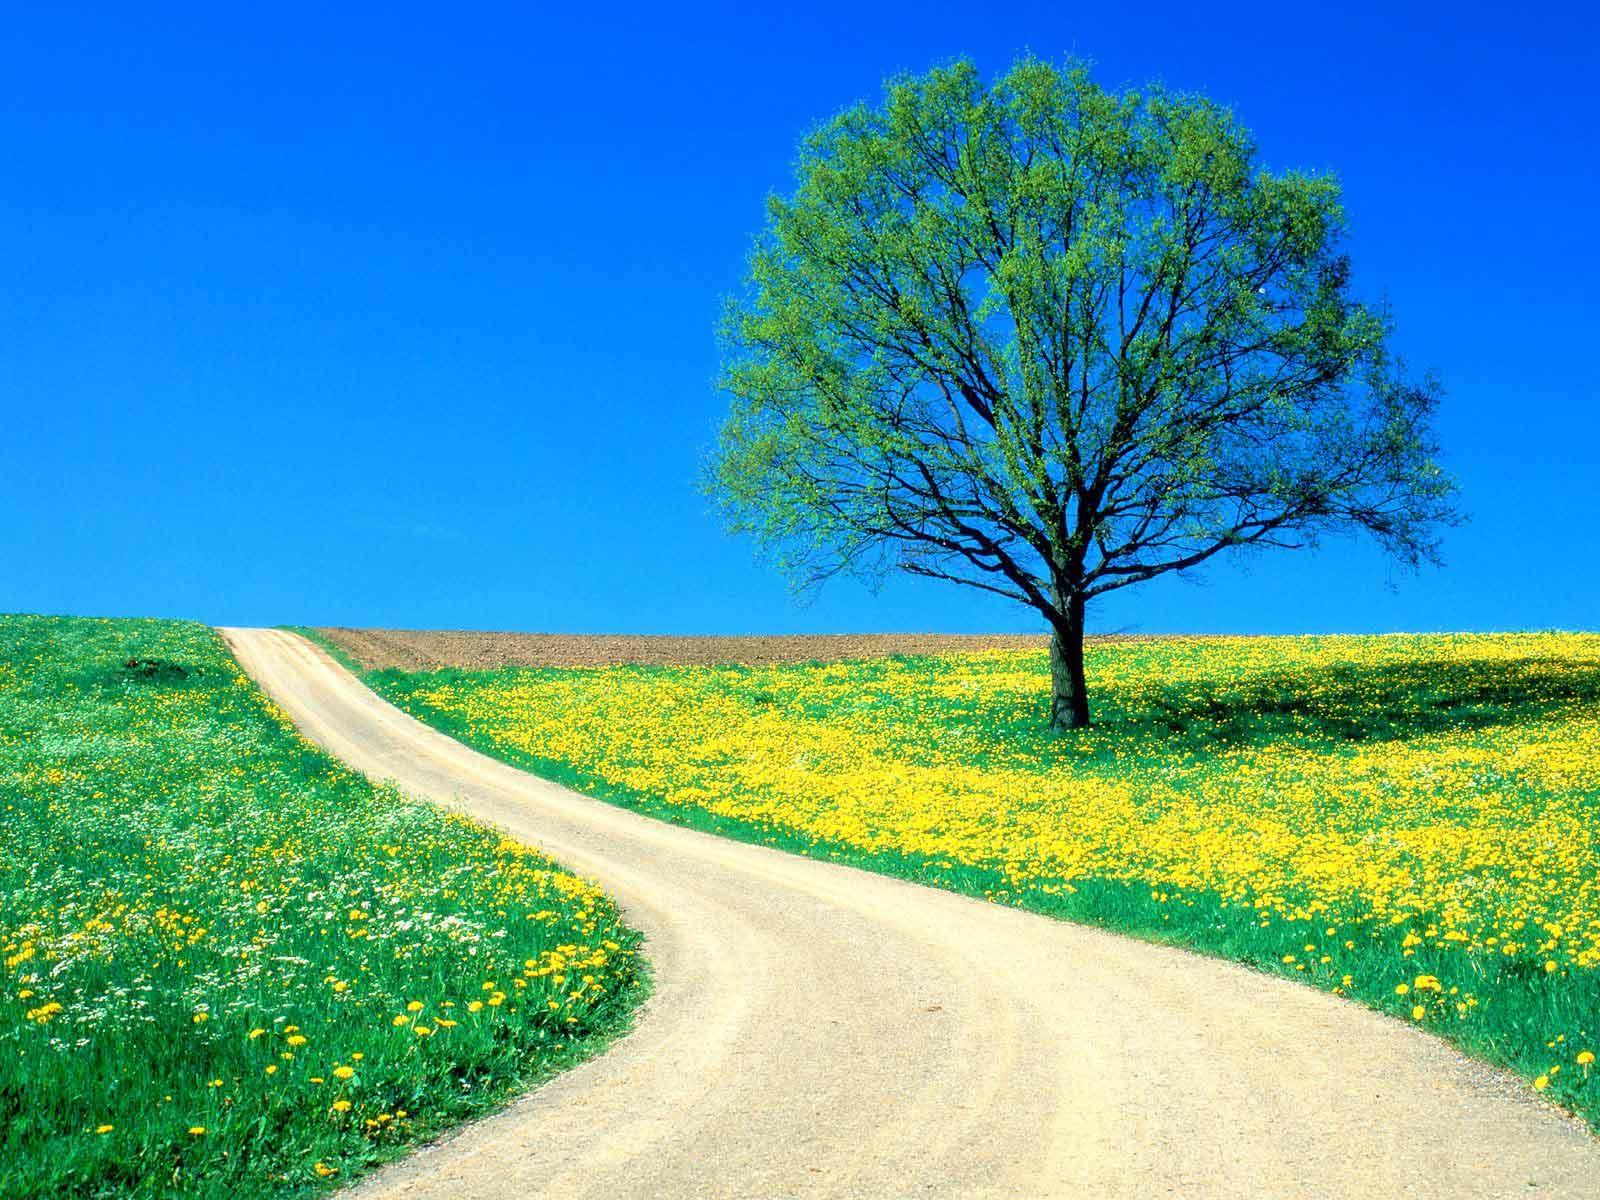 gambar jalanan terkeren wallpaper jalan di tengah bunga